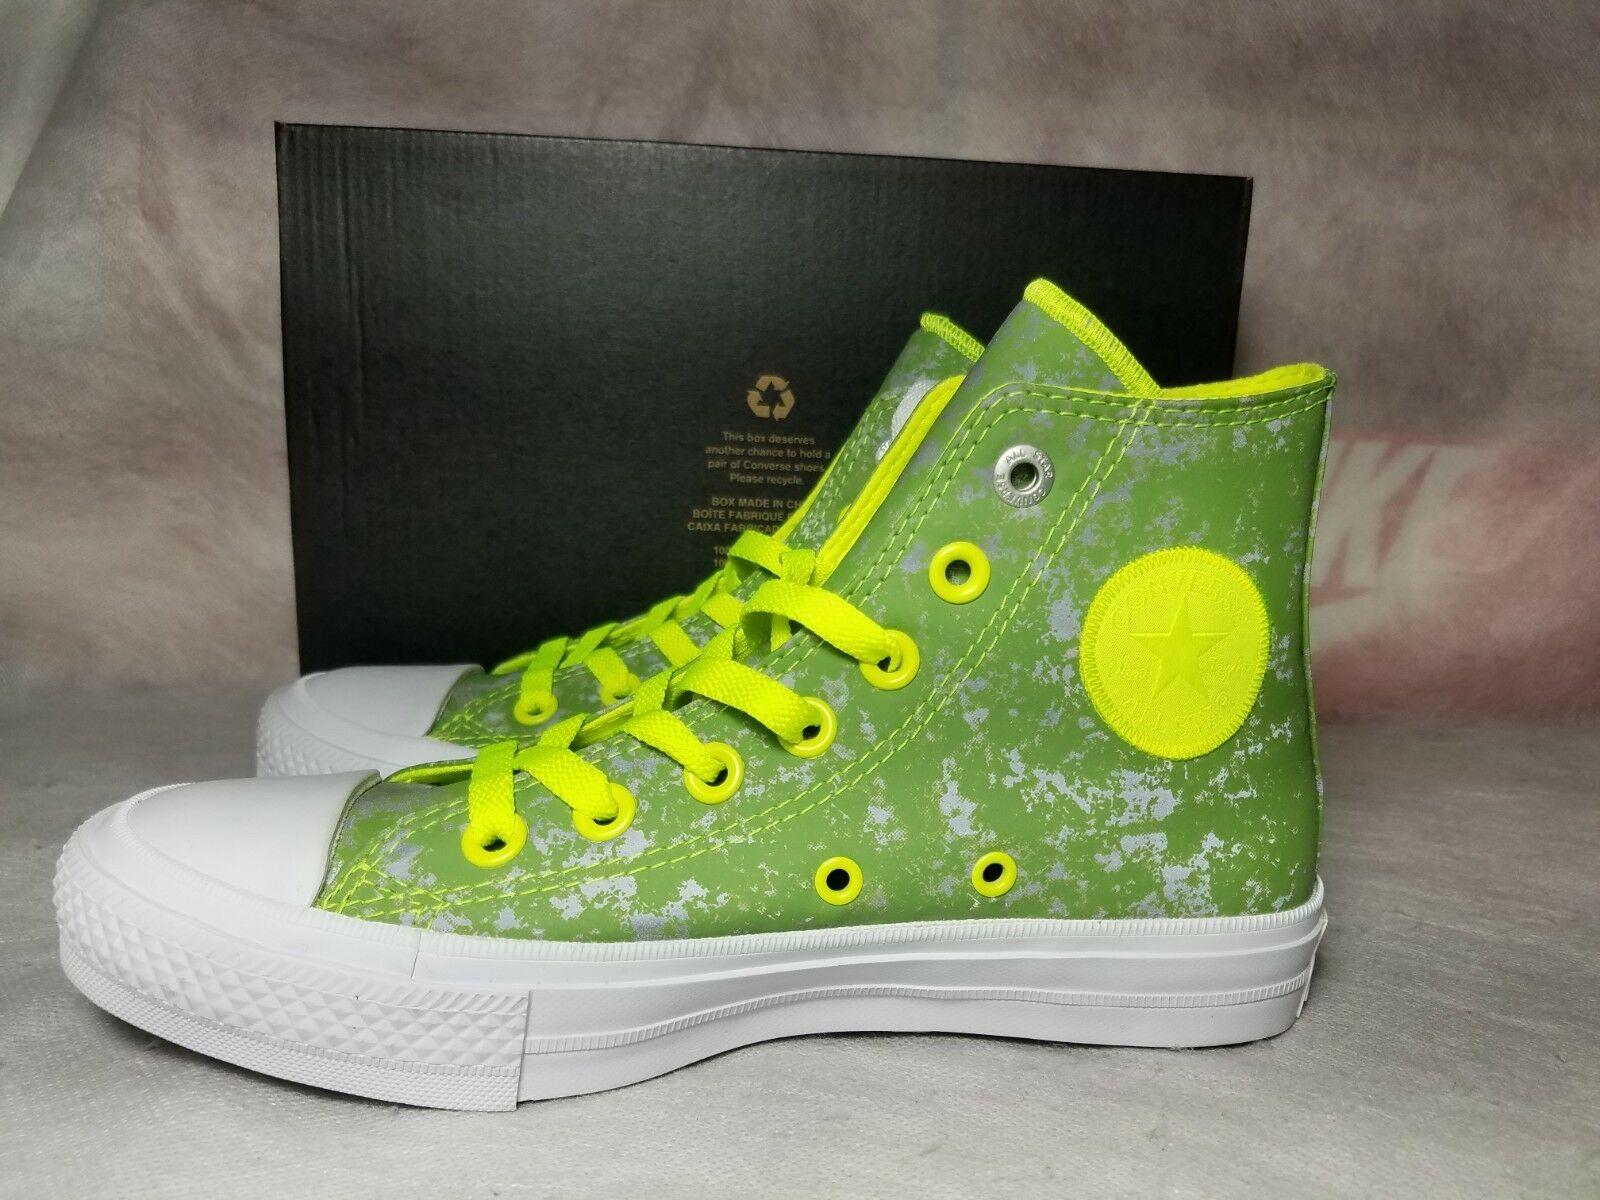 dc8d3826f3504f Converse Chuck Taylor All Star II 2 Women Size 6 Reflective Green ...